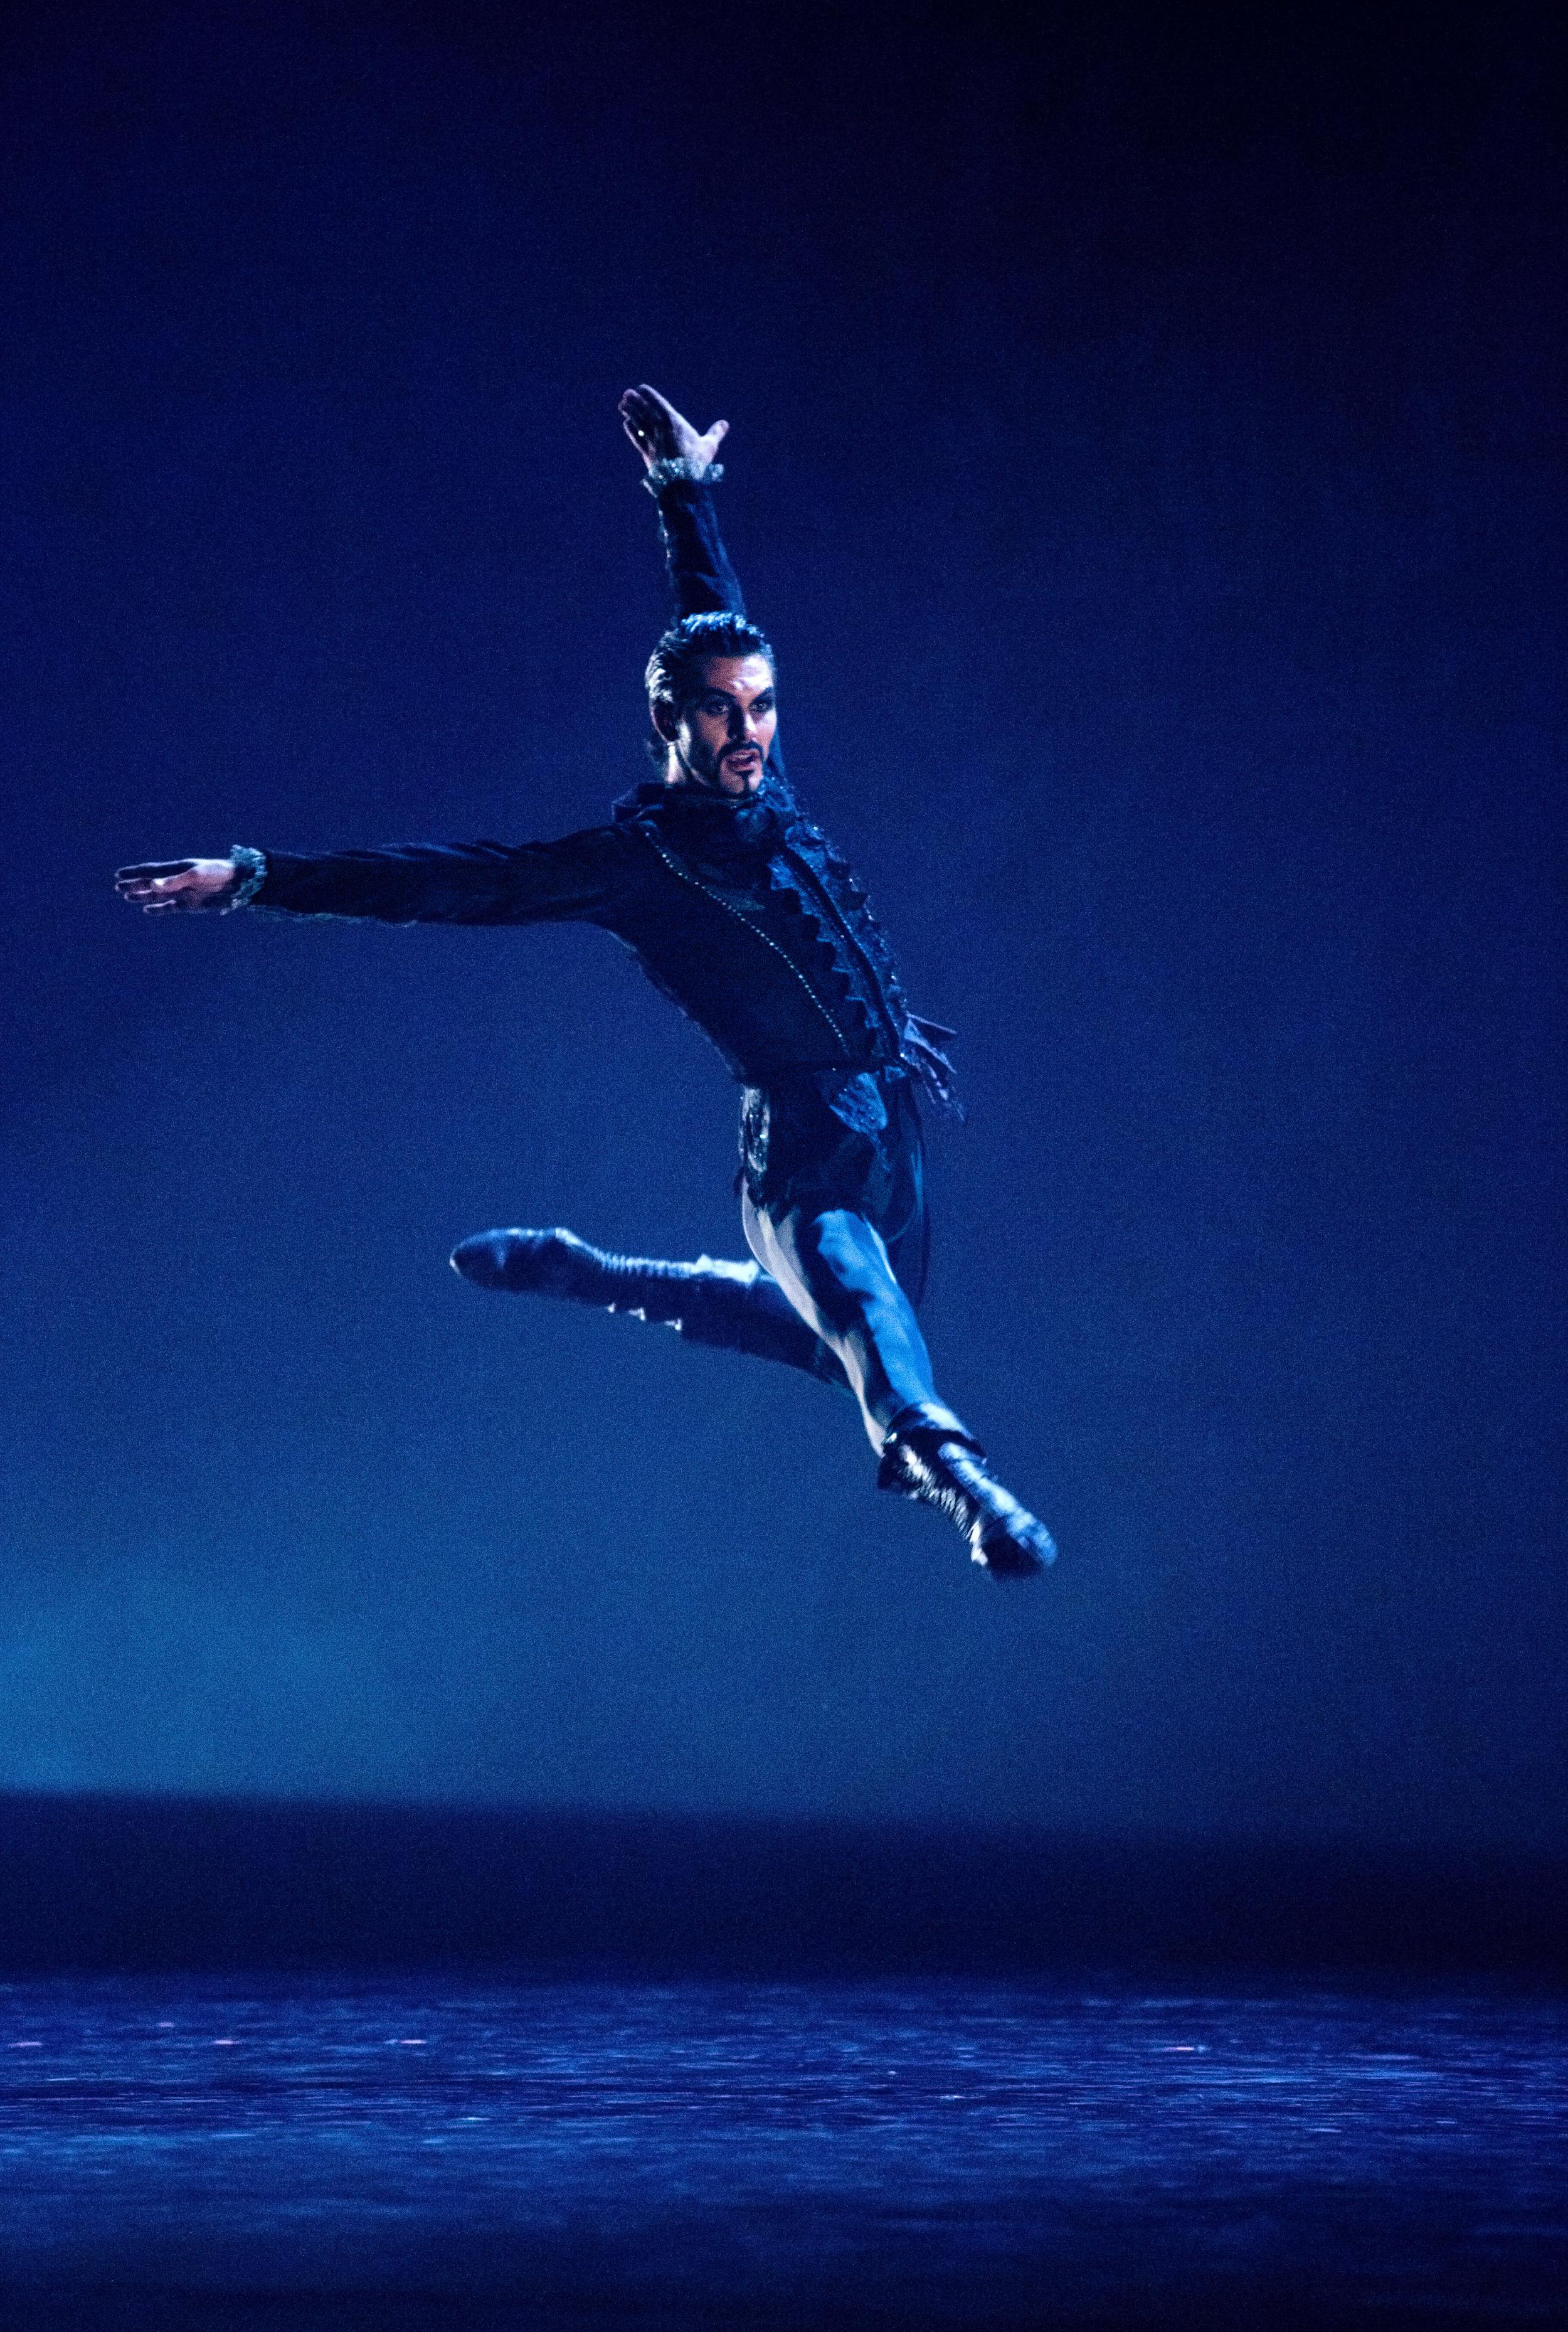 Kelley McKinlay leap